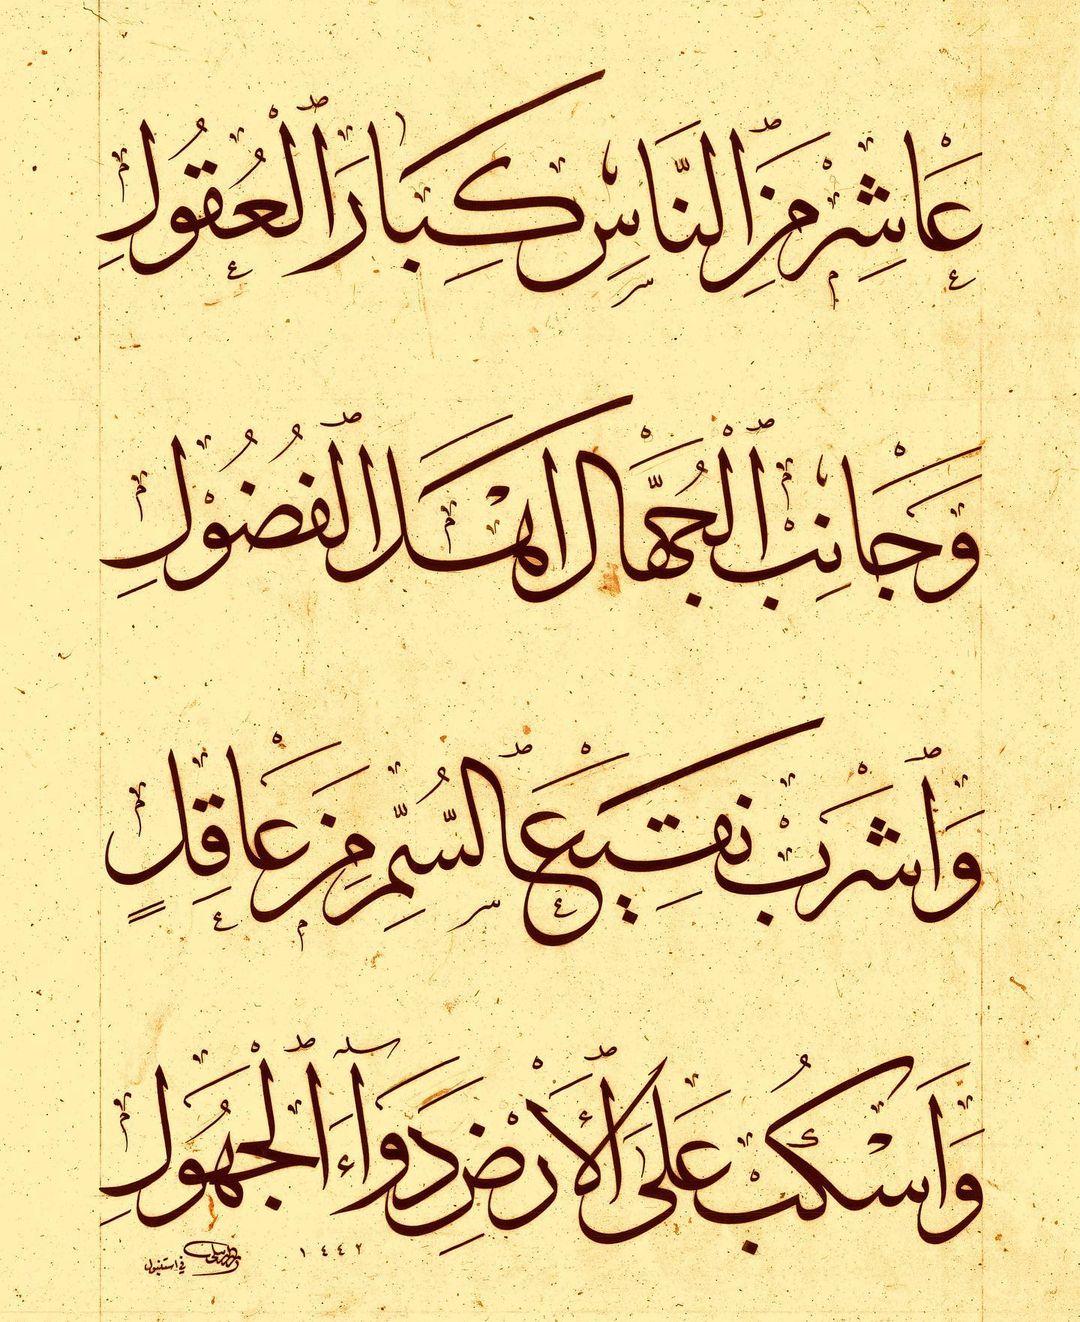 Professional Calligrapher Bijar Arbilly Calligraphy  رباعيات الحكيم عمر الخيام #calligraphy #kunst #art #tehran #istanbul #arabic #lo… 569